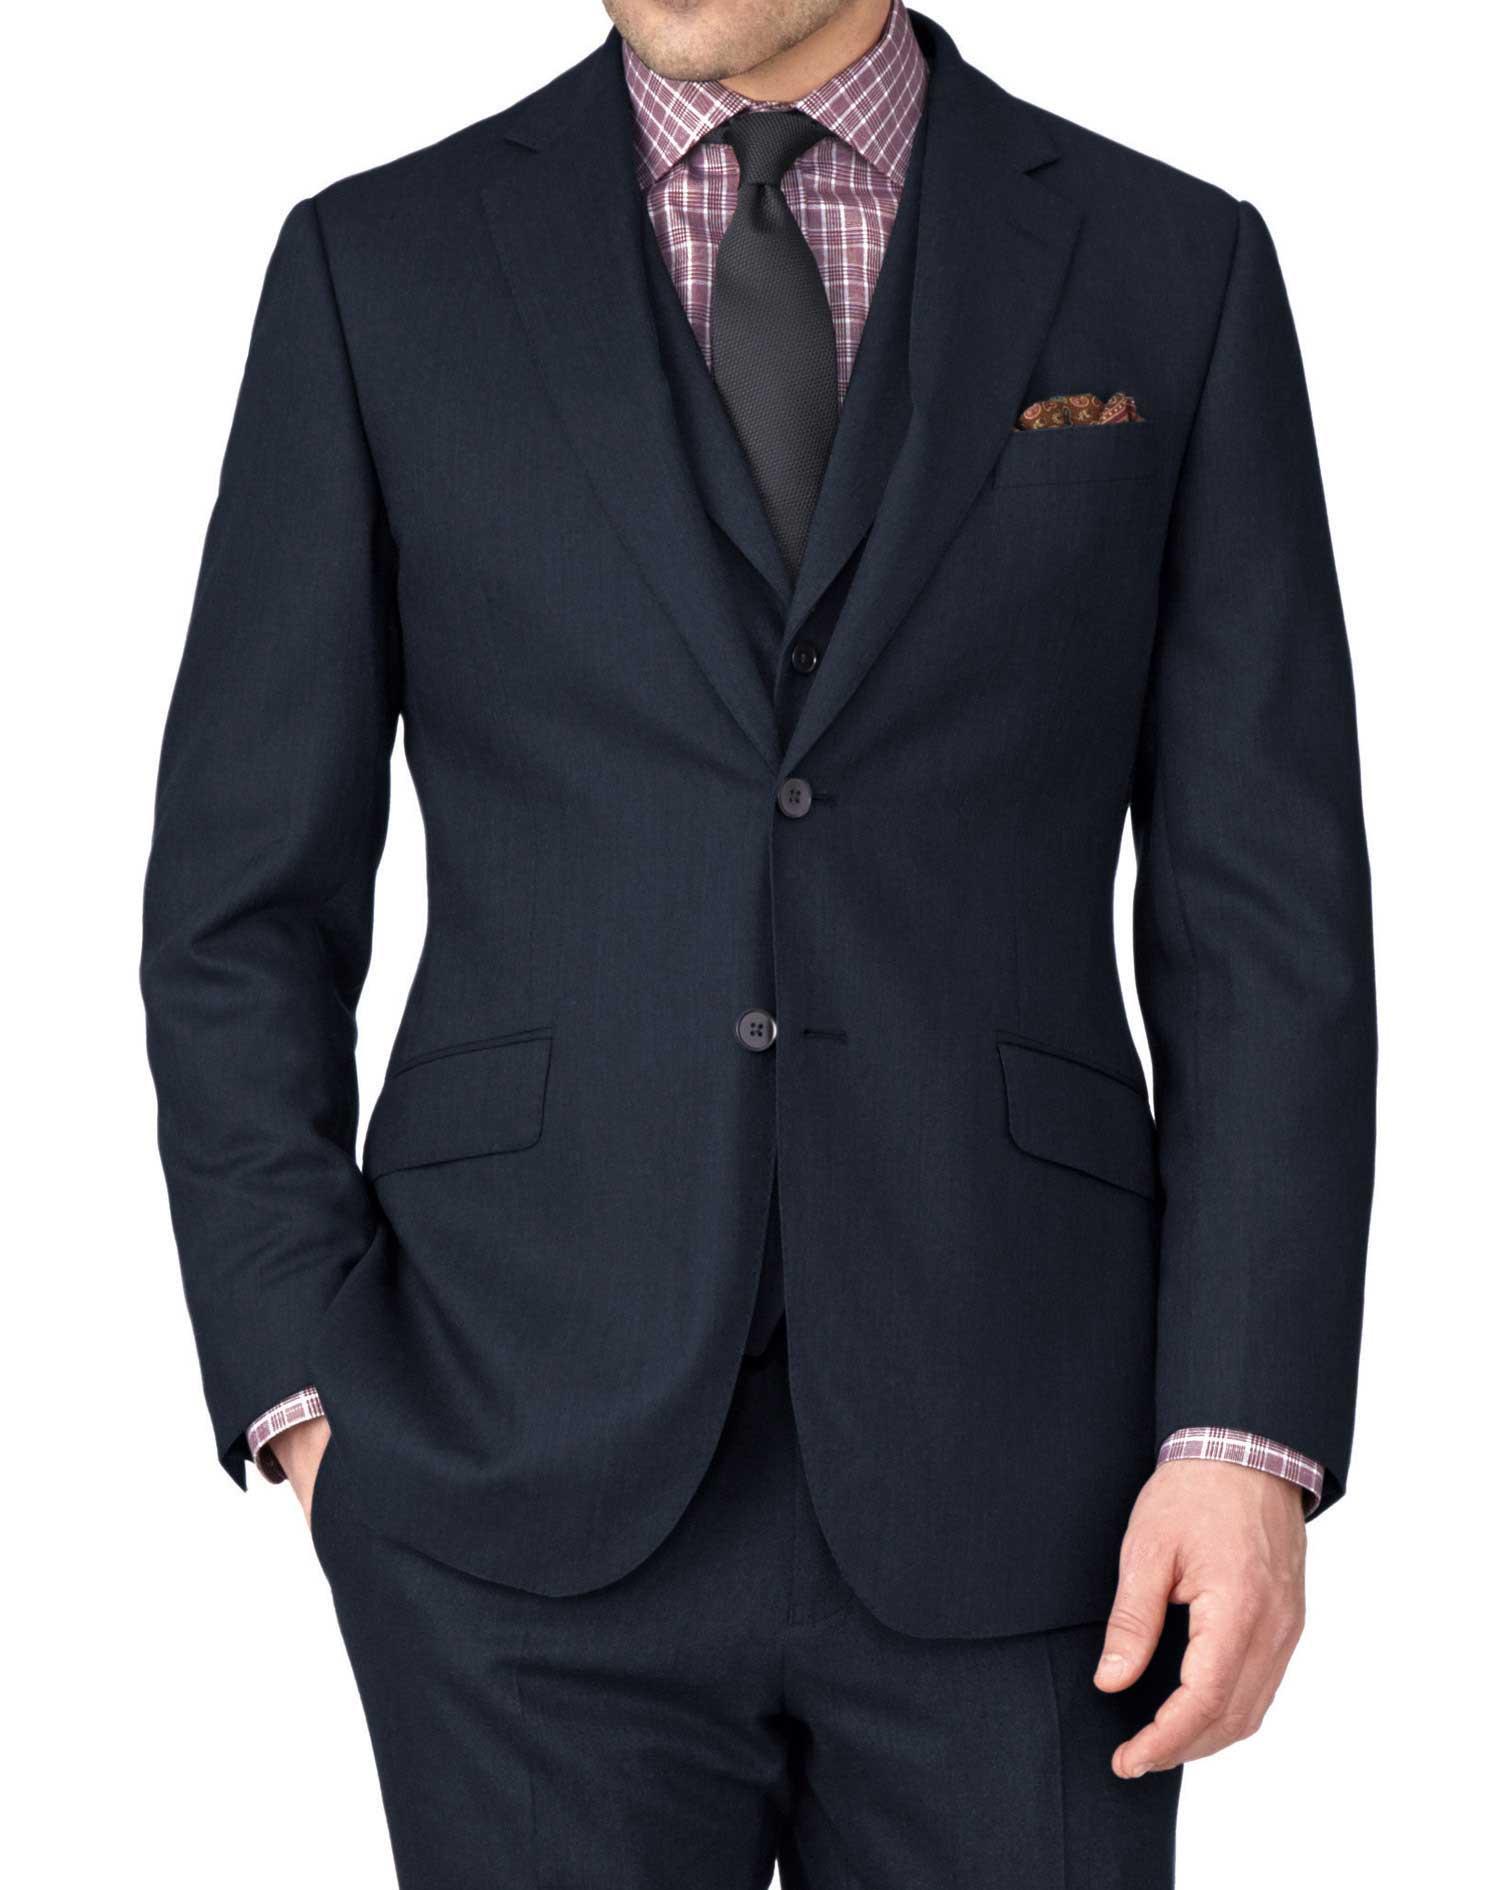 Indigo Slim Fit Saxony Business Suit Wool Jacket Size 38 Regular by Charles Tyrwhitt